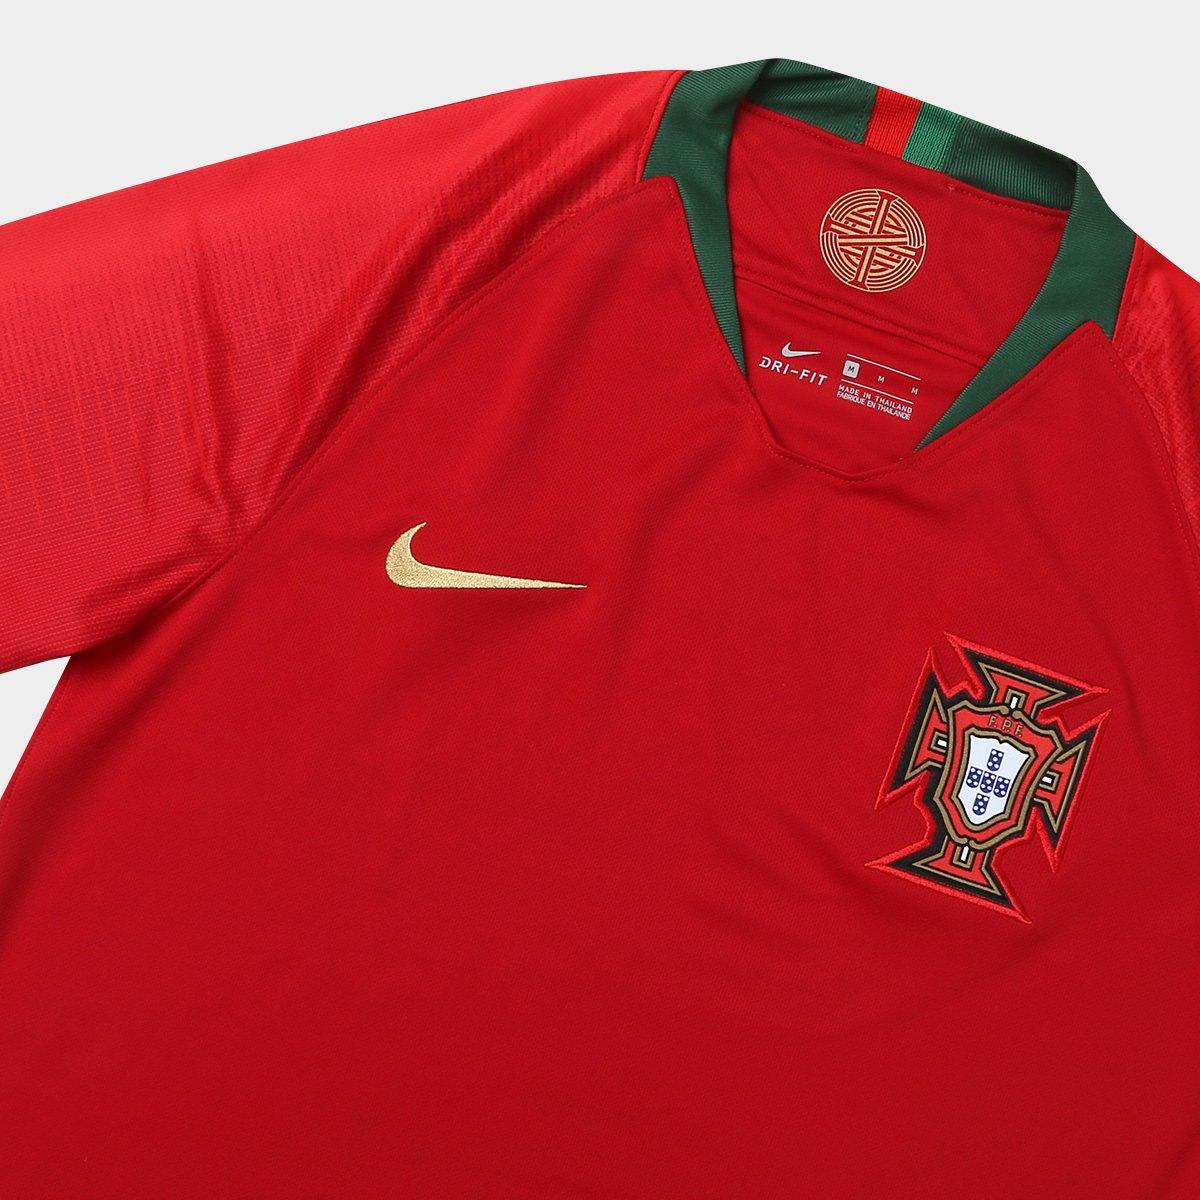 55a8b077f4 ... Camisa Seleção Portugal Home 2018 n° 7 Ronaldo - Torcedor Nike Masculina